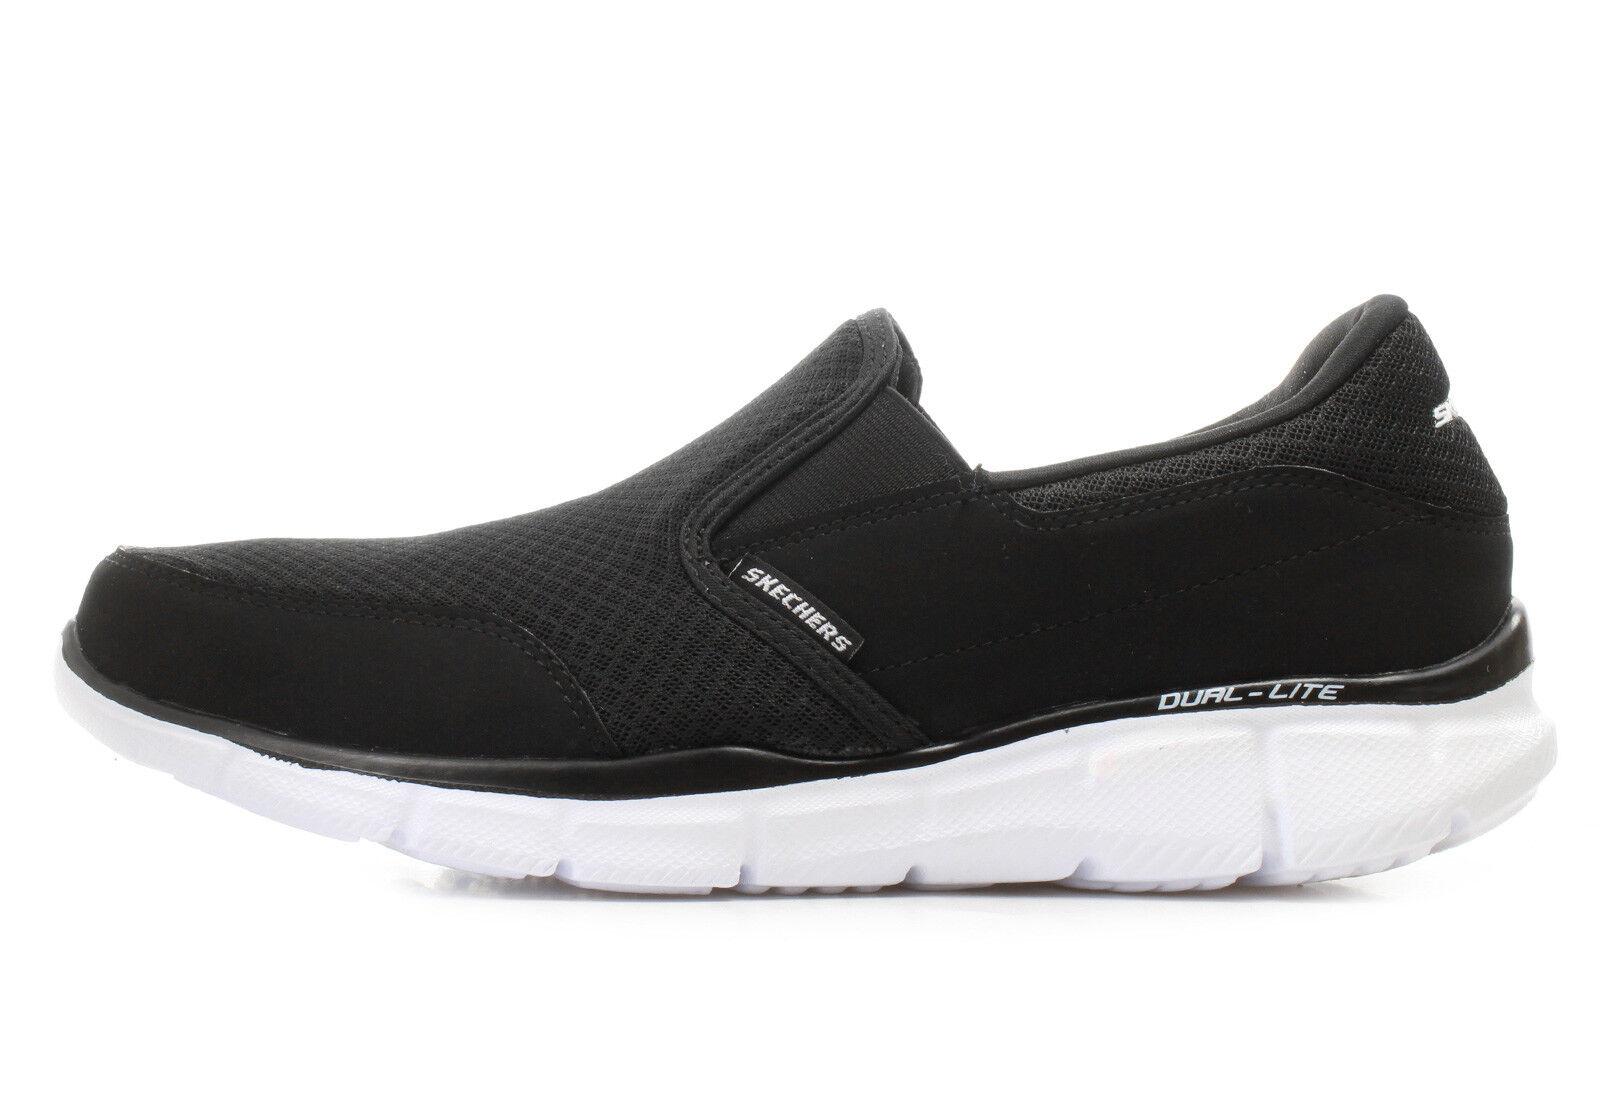 Skechers Men's Equaliser Persistant Slip On Sport Fashion Trainers Memory Foam